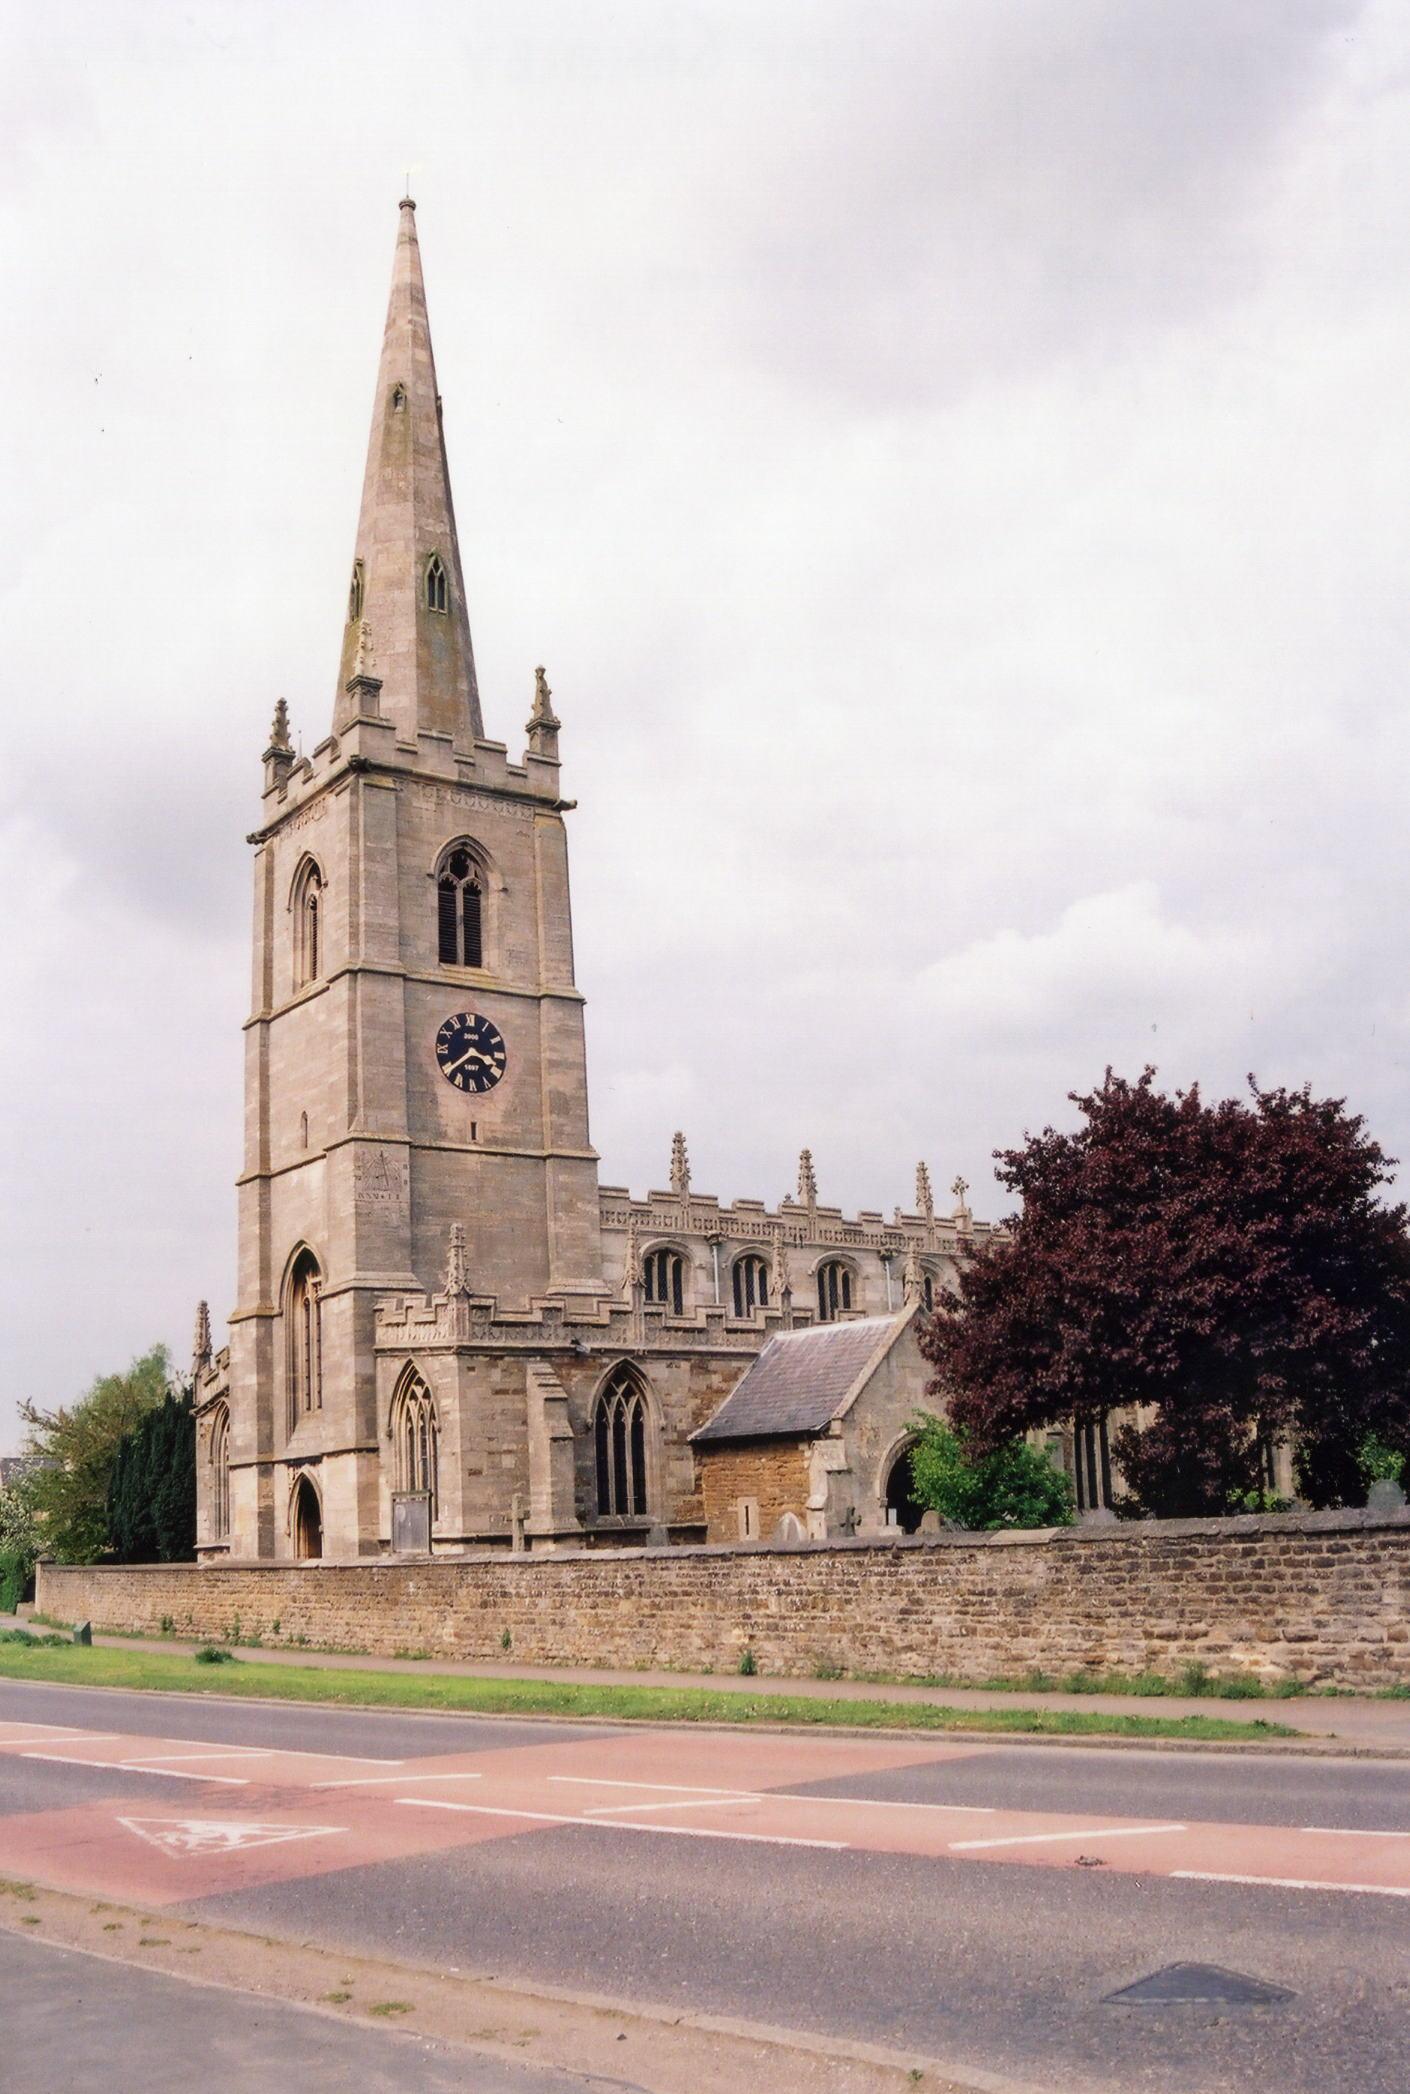 St. Sebastian's Church